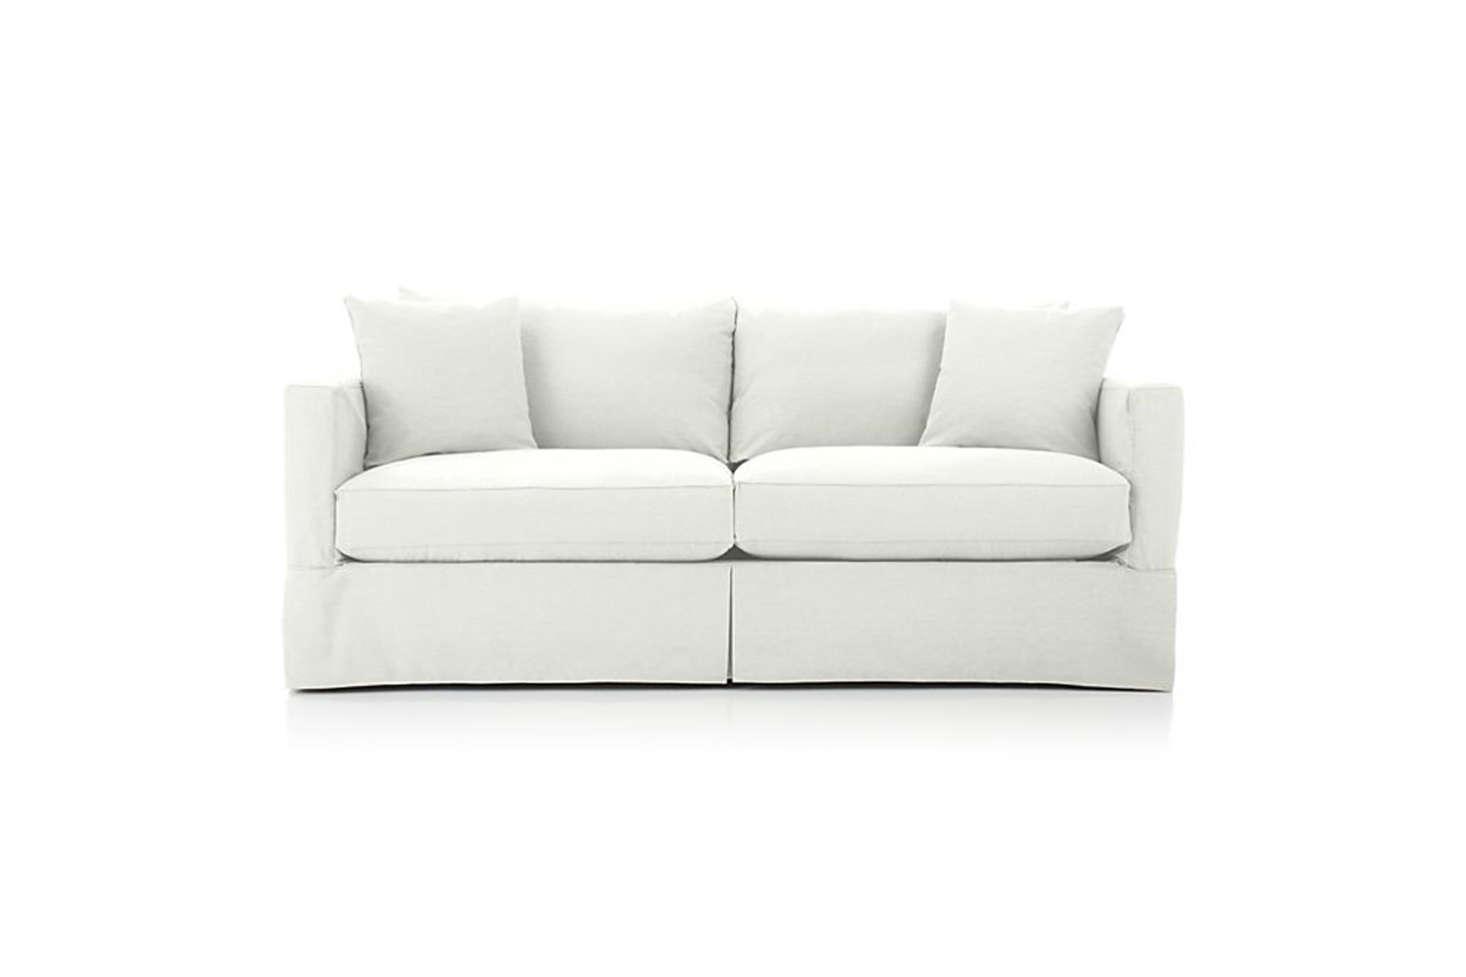 Crate U0026 Barrelu0027s Willow Sofa Is A Straightforward Sofa Made In North  Carolina; $1,899 At